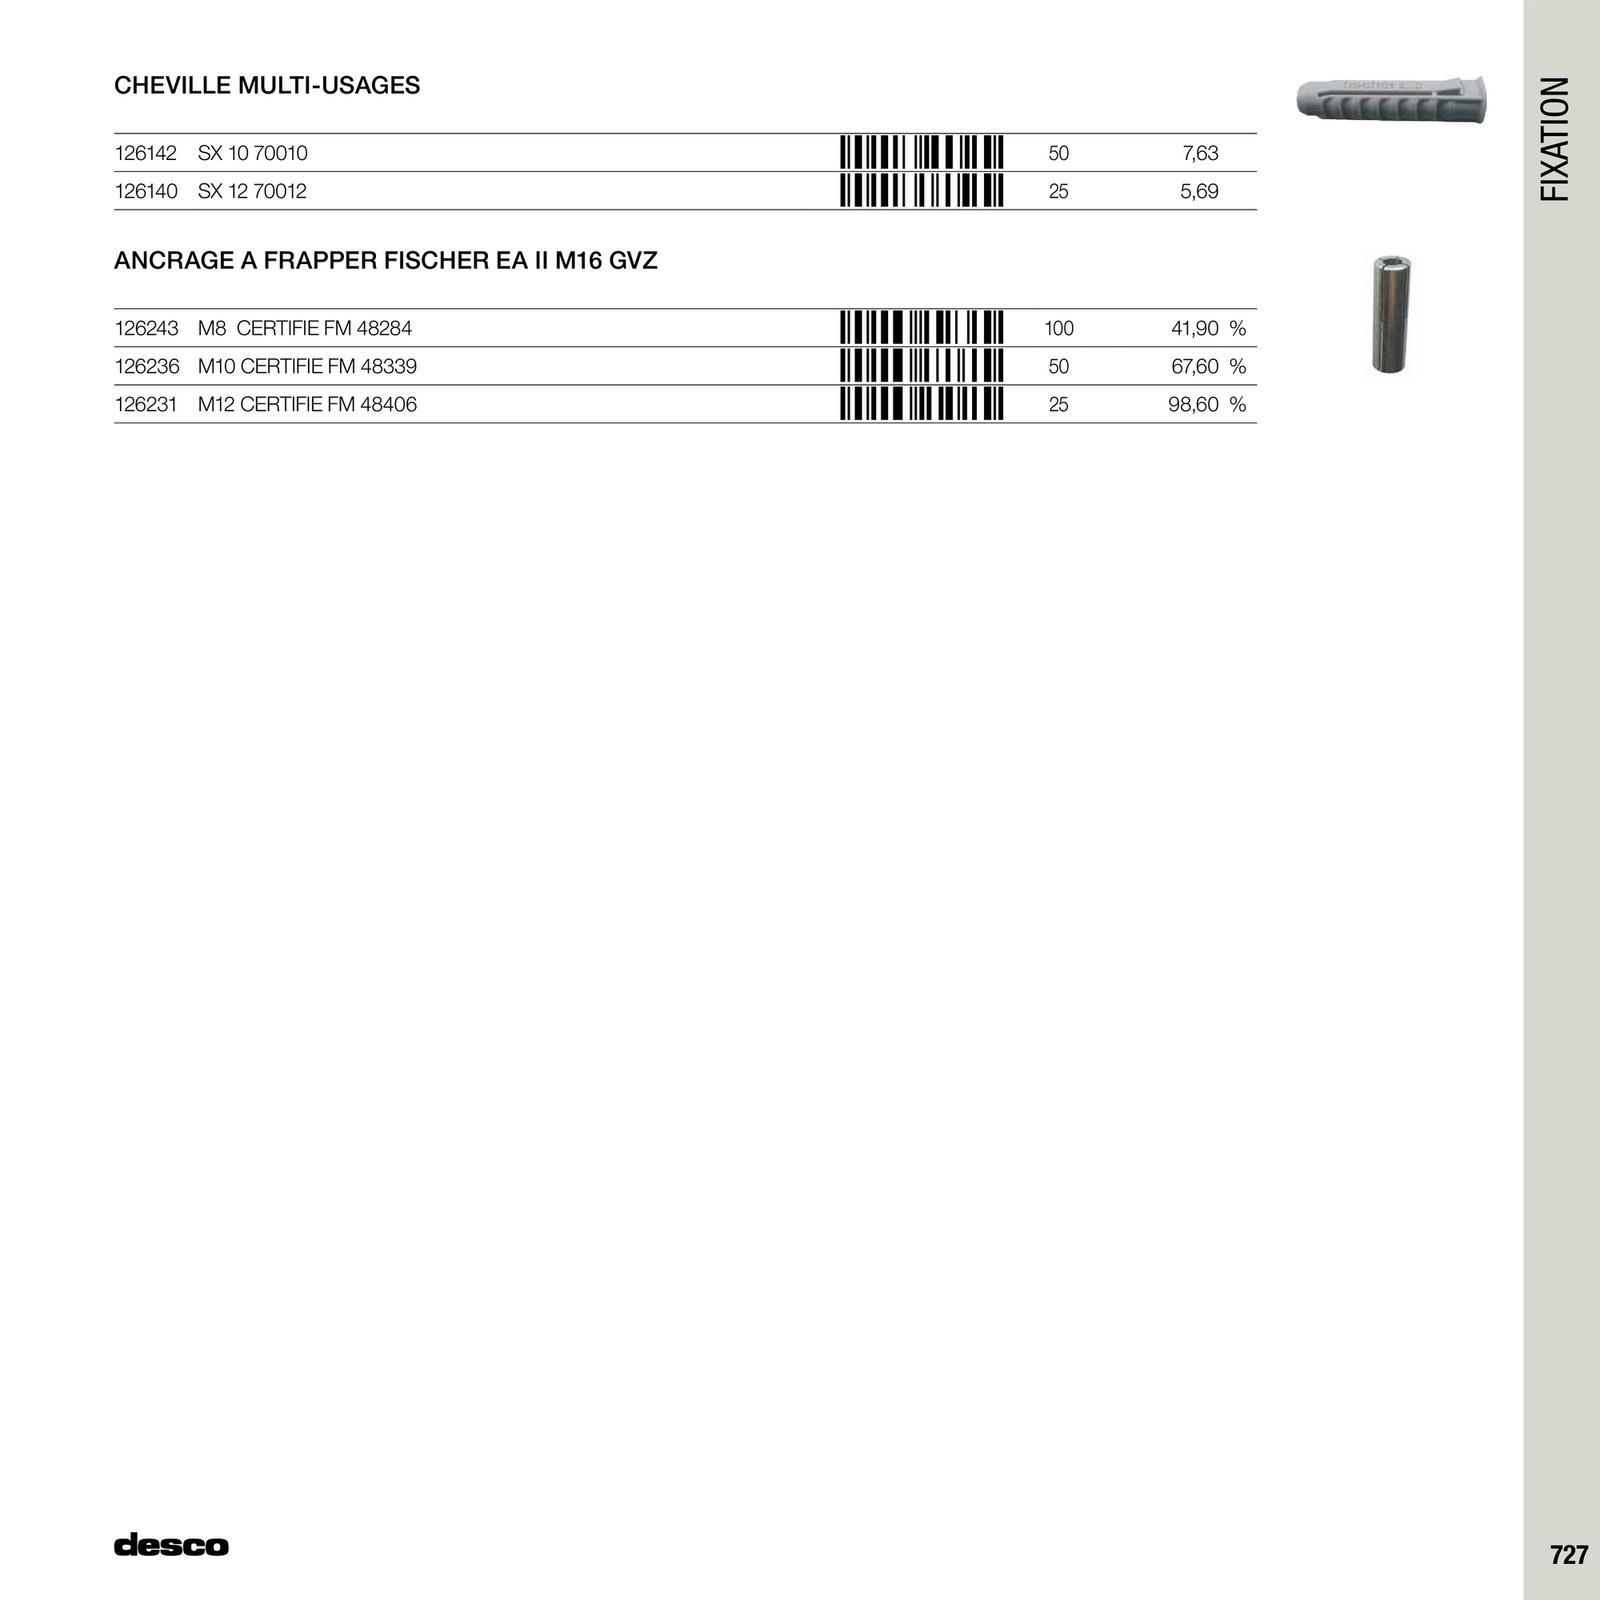 desco lmp tarif installation chauffage fixation page 728 729. Black Bedroom Furniture Sets. Home Design Ideas